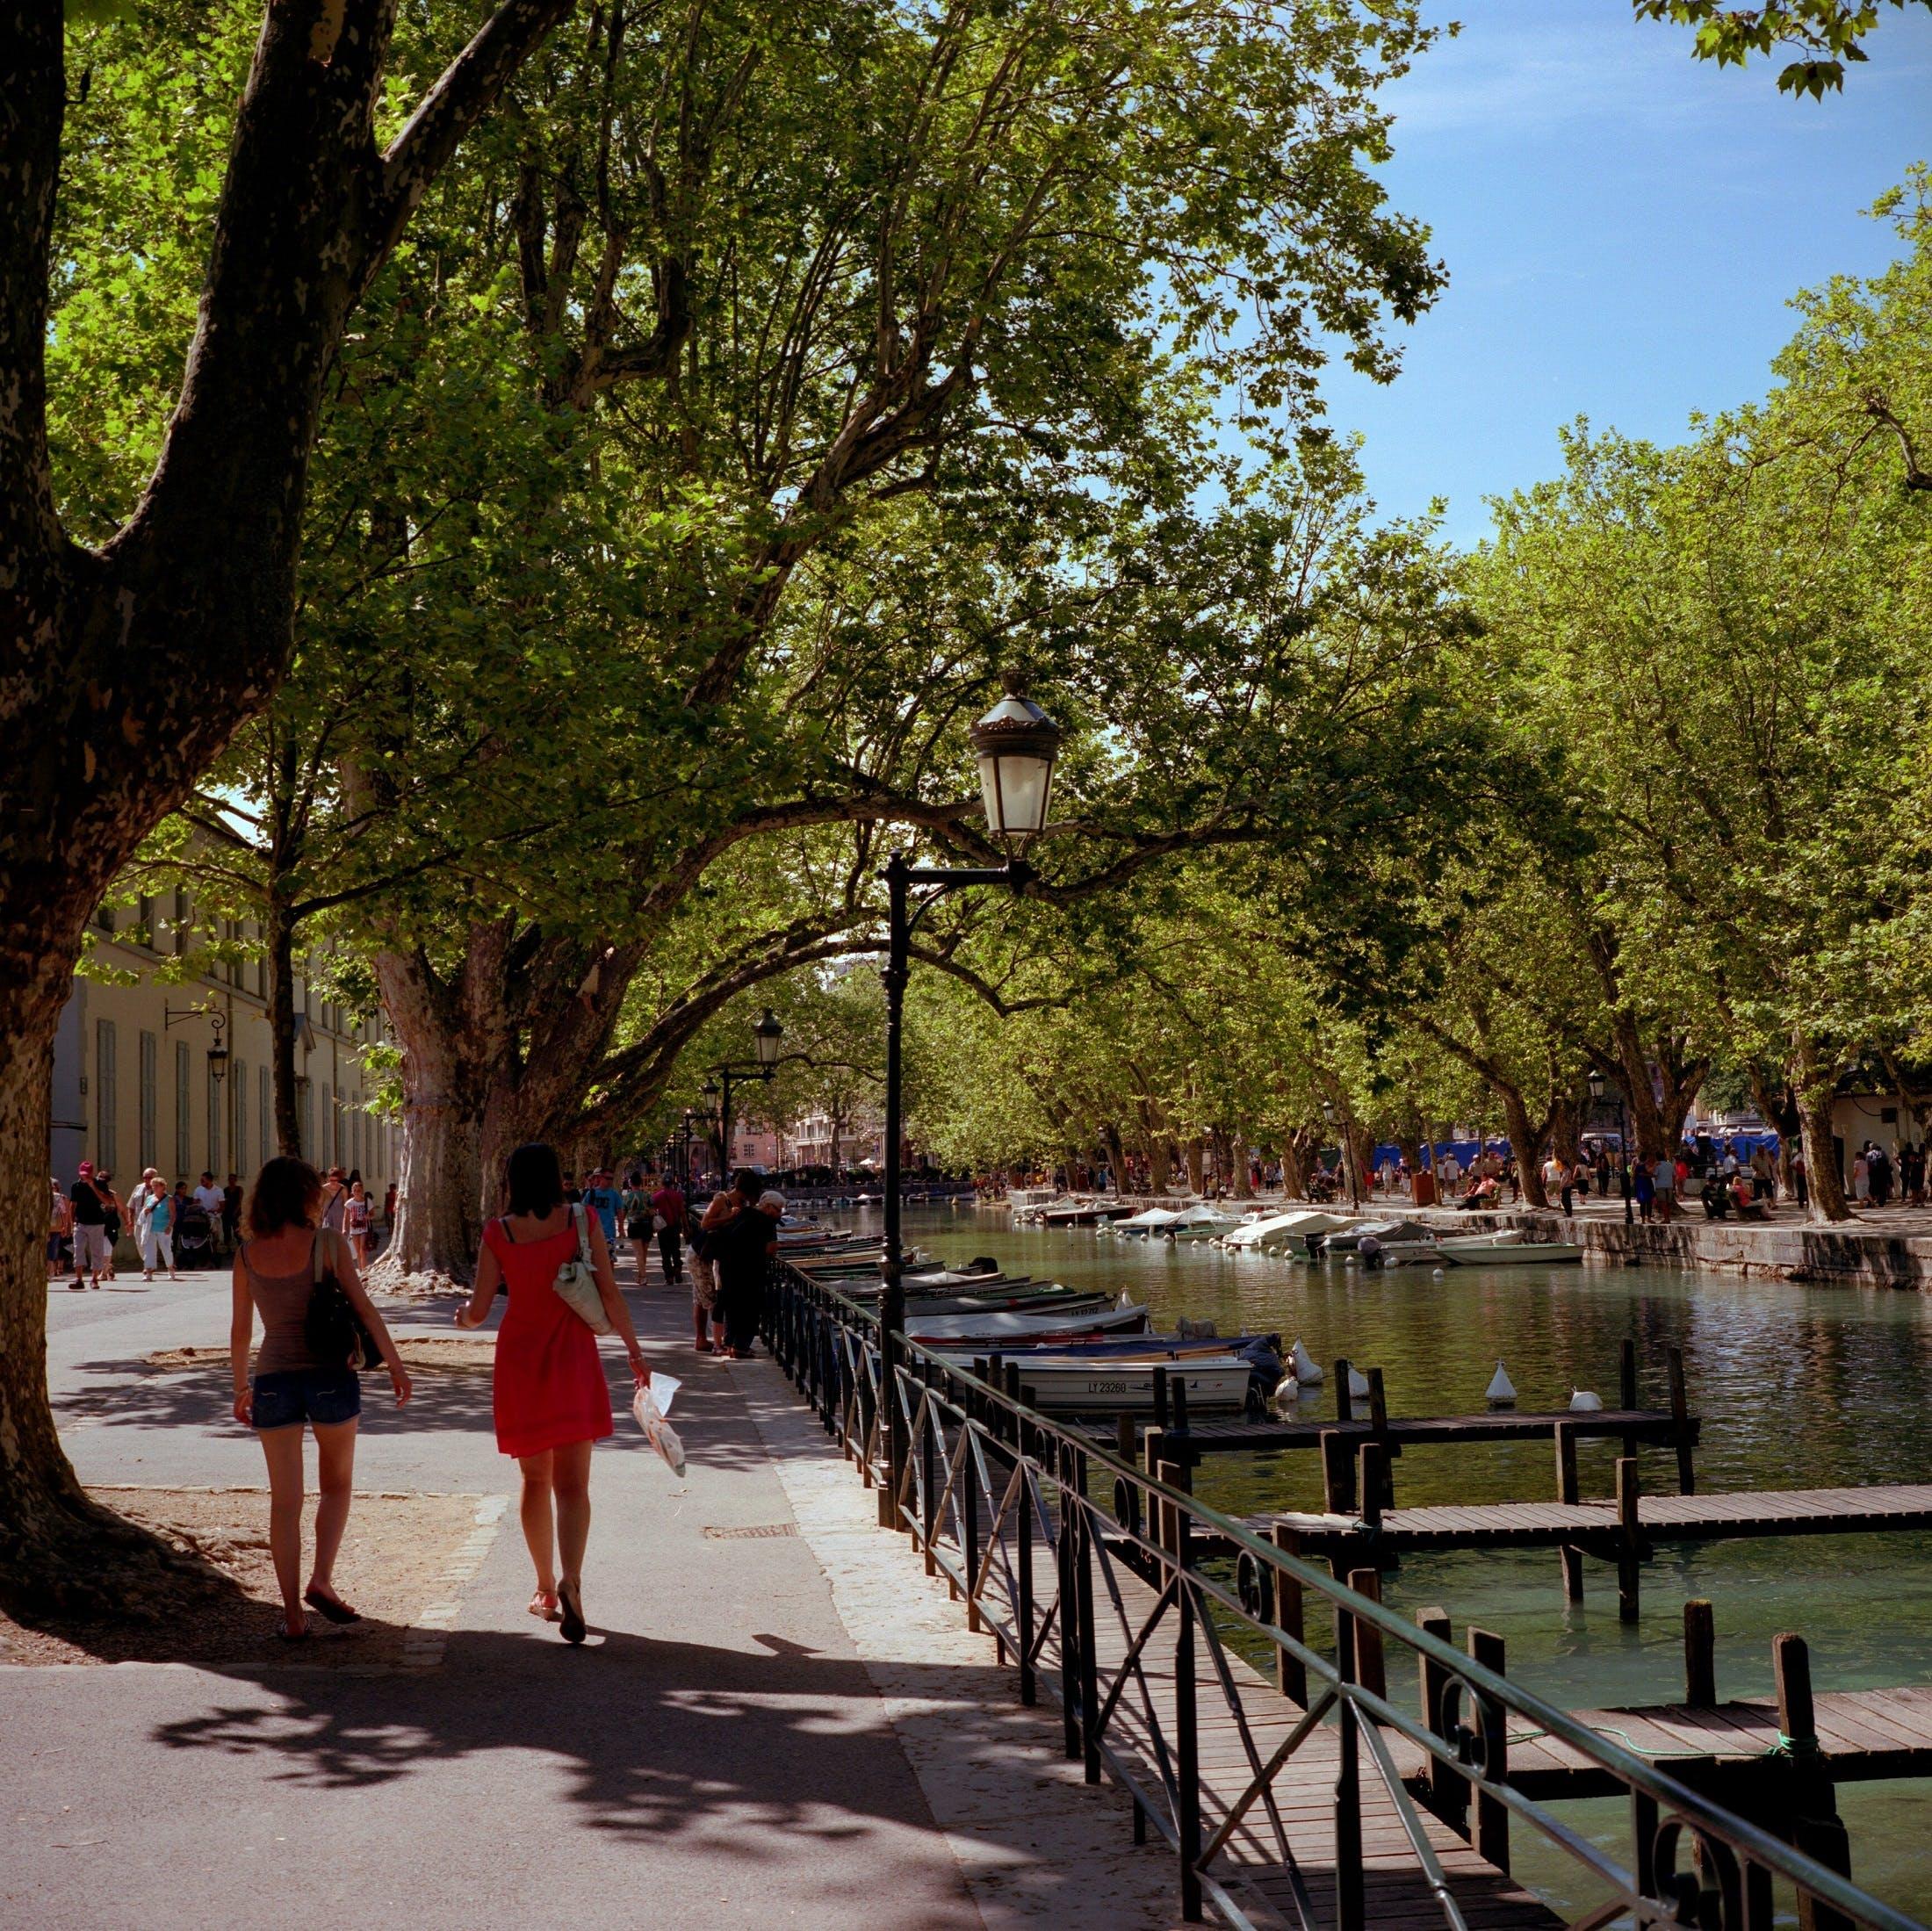 Kostnadsfri bild av arkitektur, båtar, gata, kanal